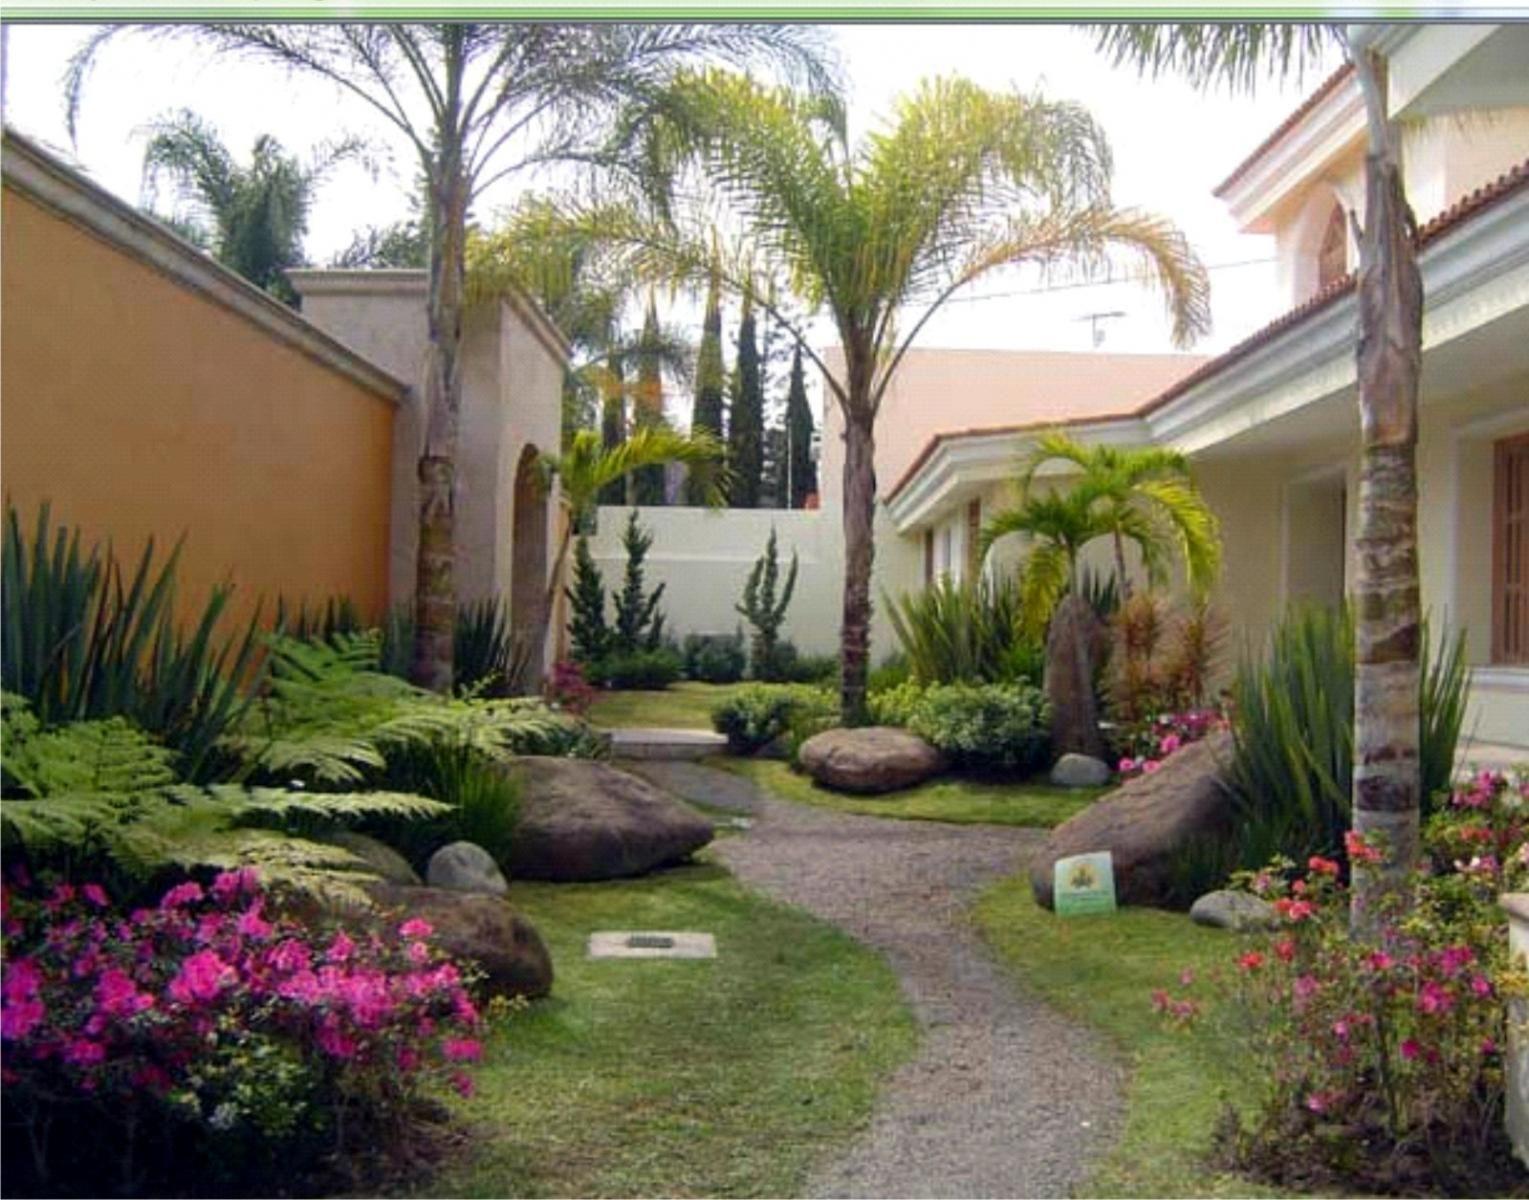 Exonerar ahora imagenes de como decorar tu jardin for Imagenes de jardines de casas